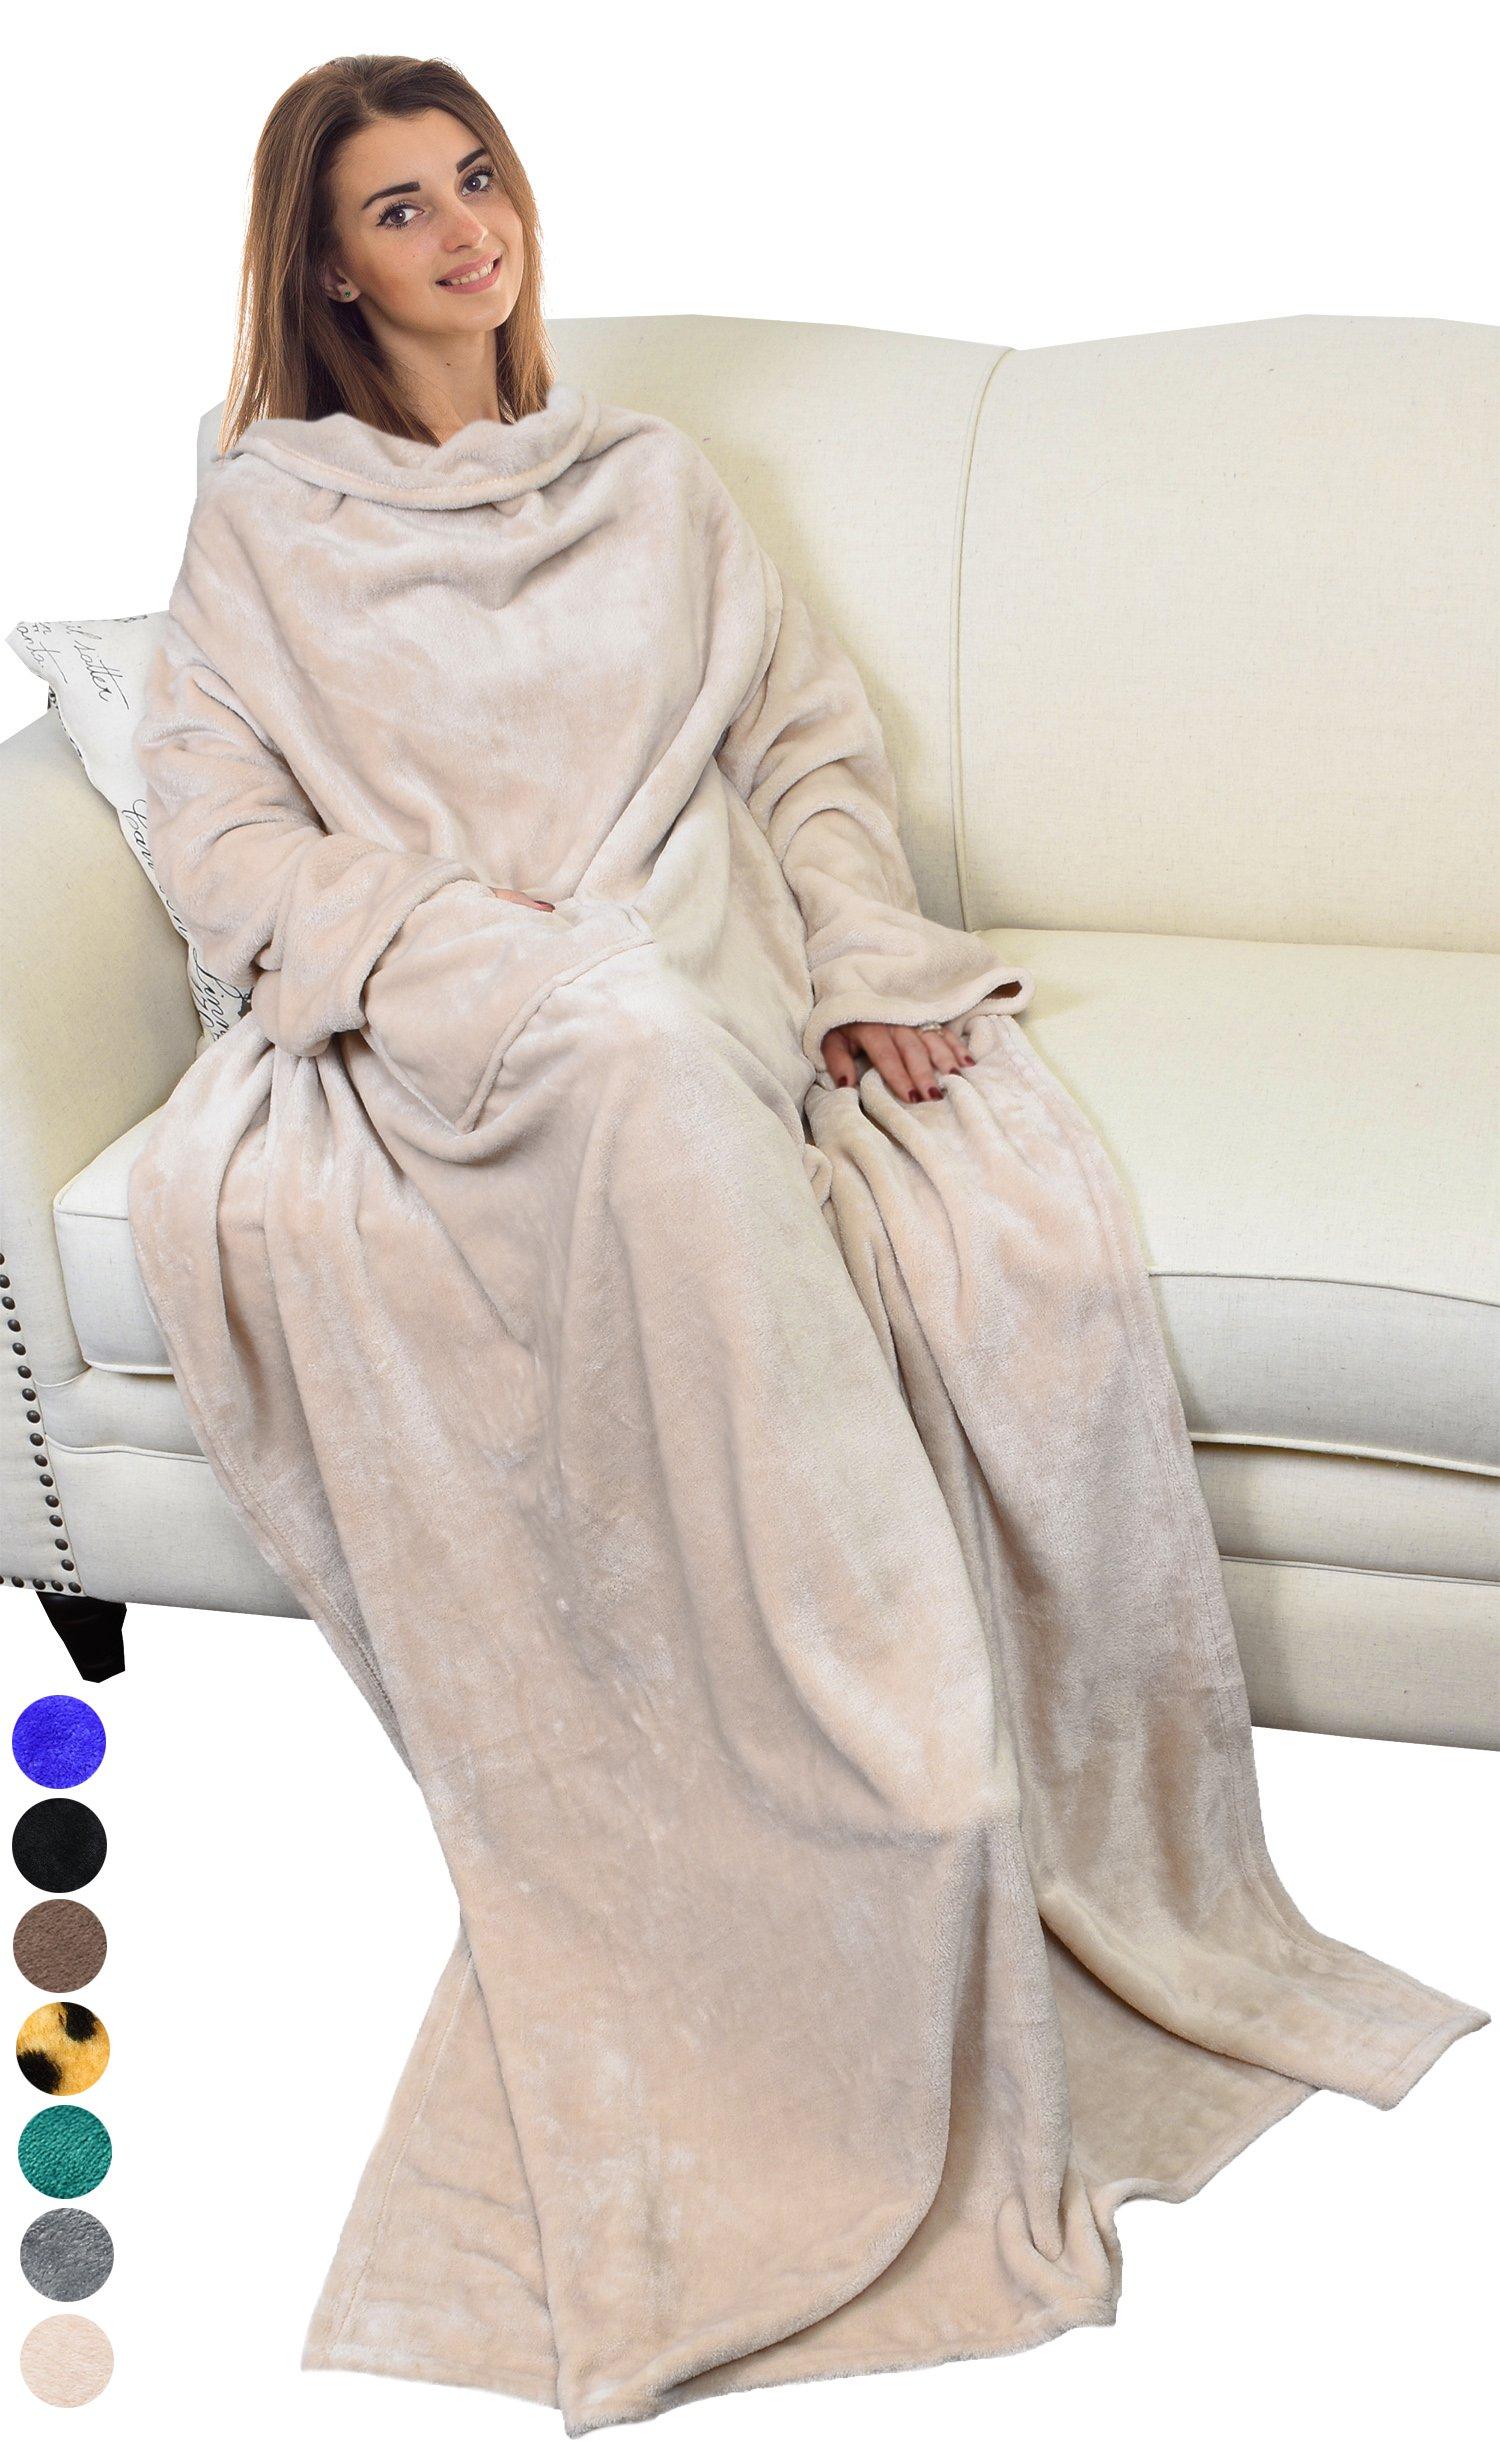 Catalonia Platinum Blanket with Sleeves, Ultra Plush Fleece Warm Blankets for Adult Women Men 185cm x 130cm, Latte